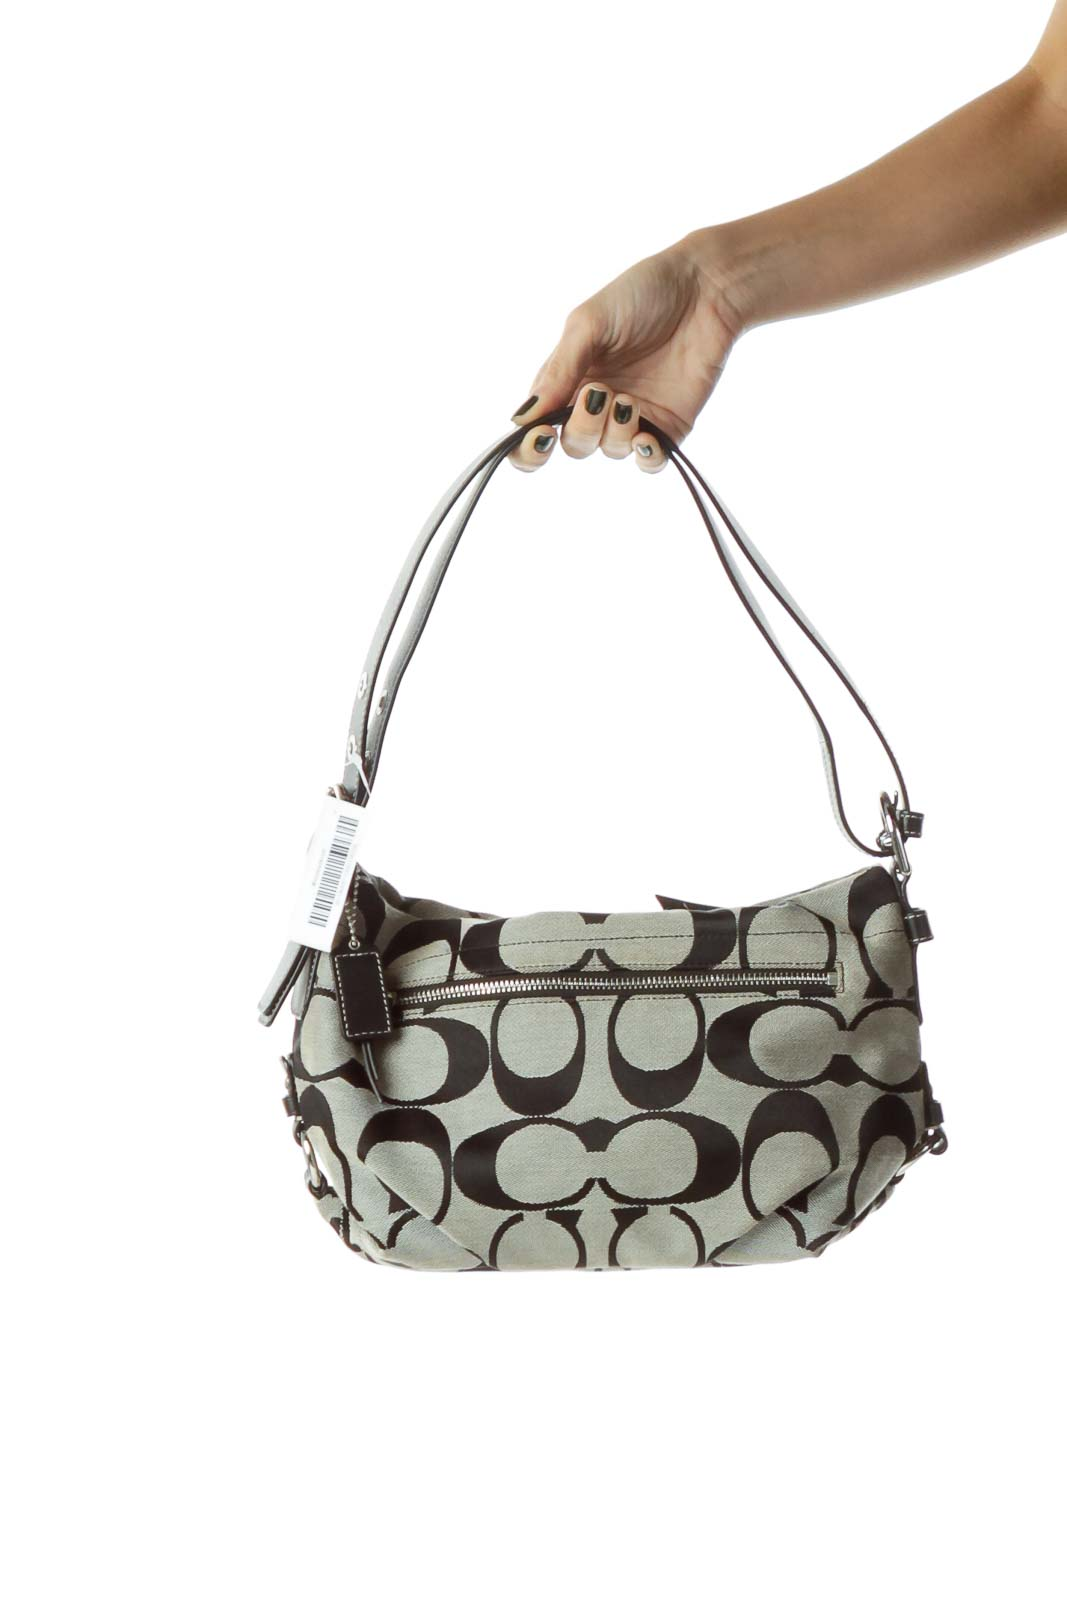 828127ee Shop Black Gray Monogrammed Shoulder Bag clothing and handbags at ...